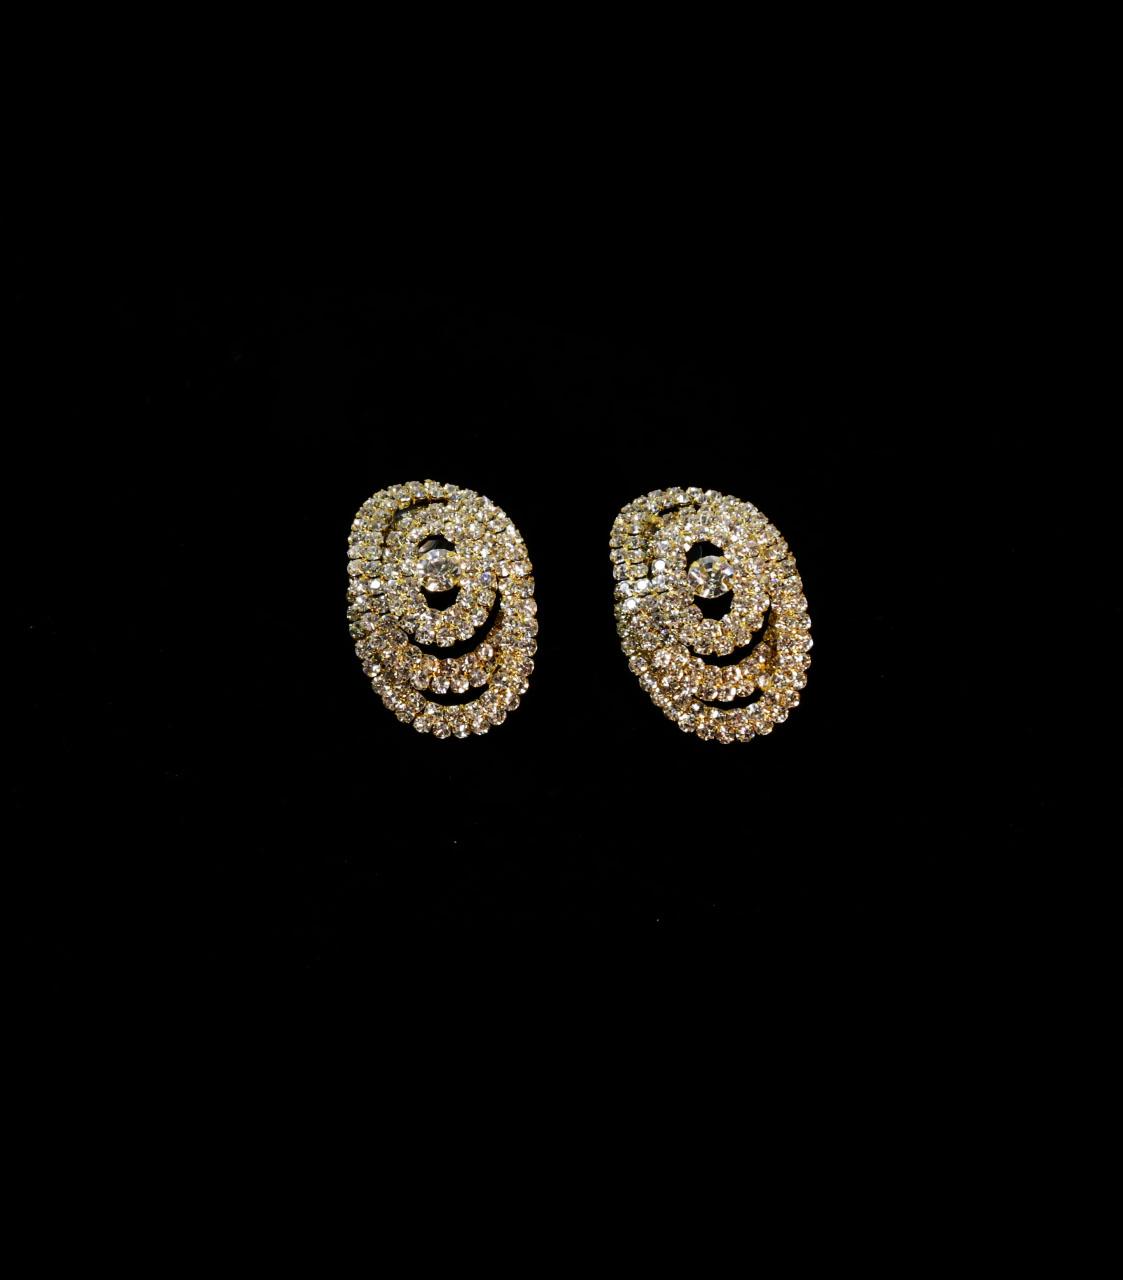 Round Overlapping Rhinestone Earrings